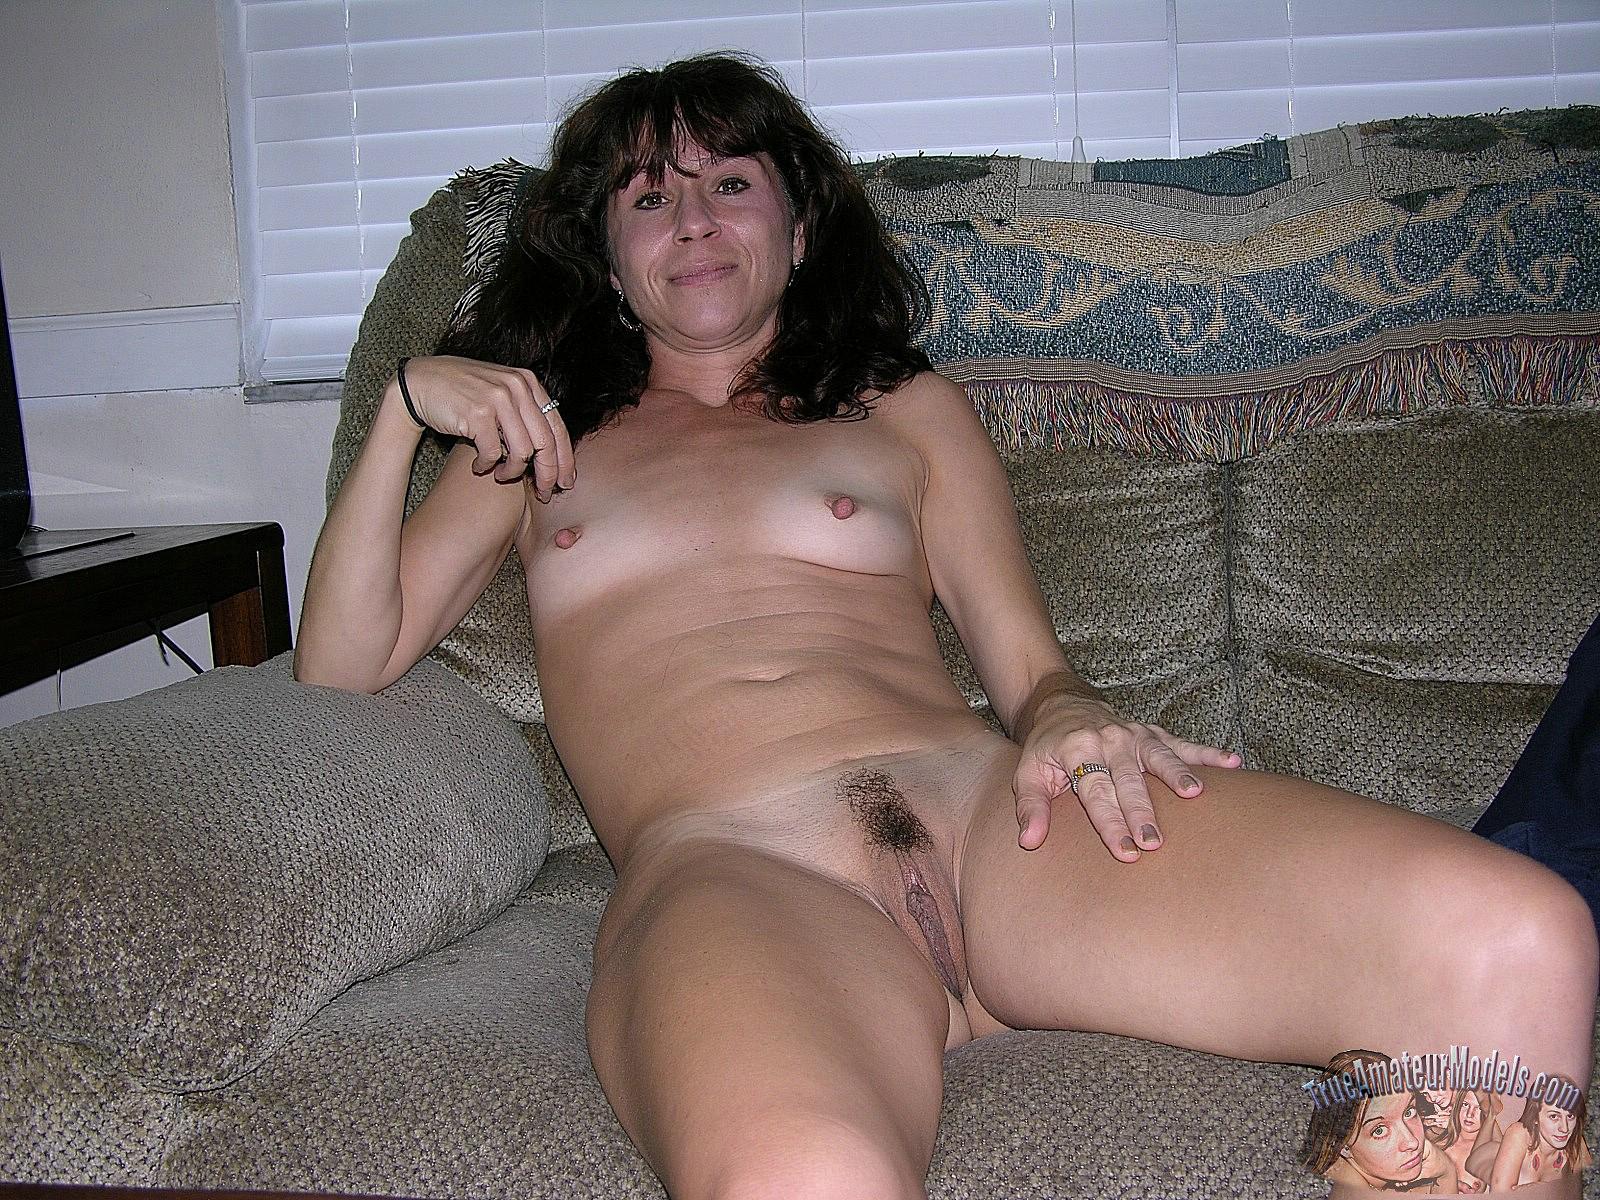 Real amateur soccer mom cheats porn tube